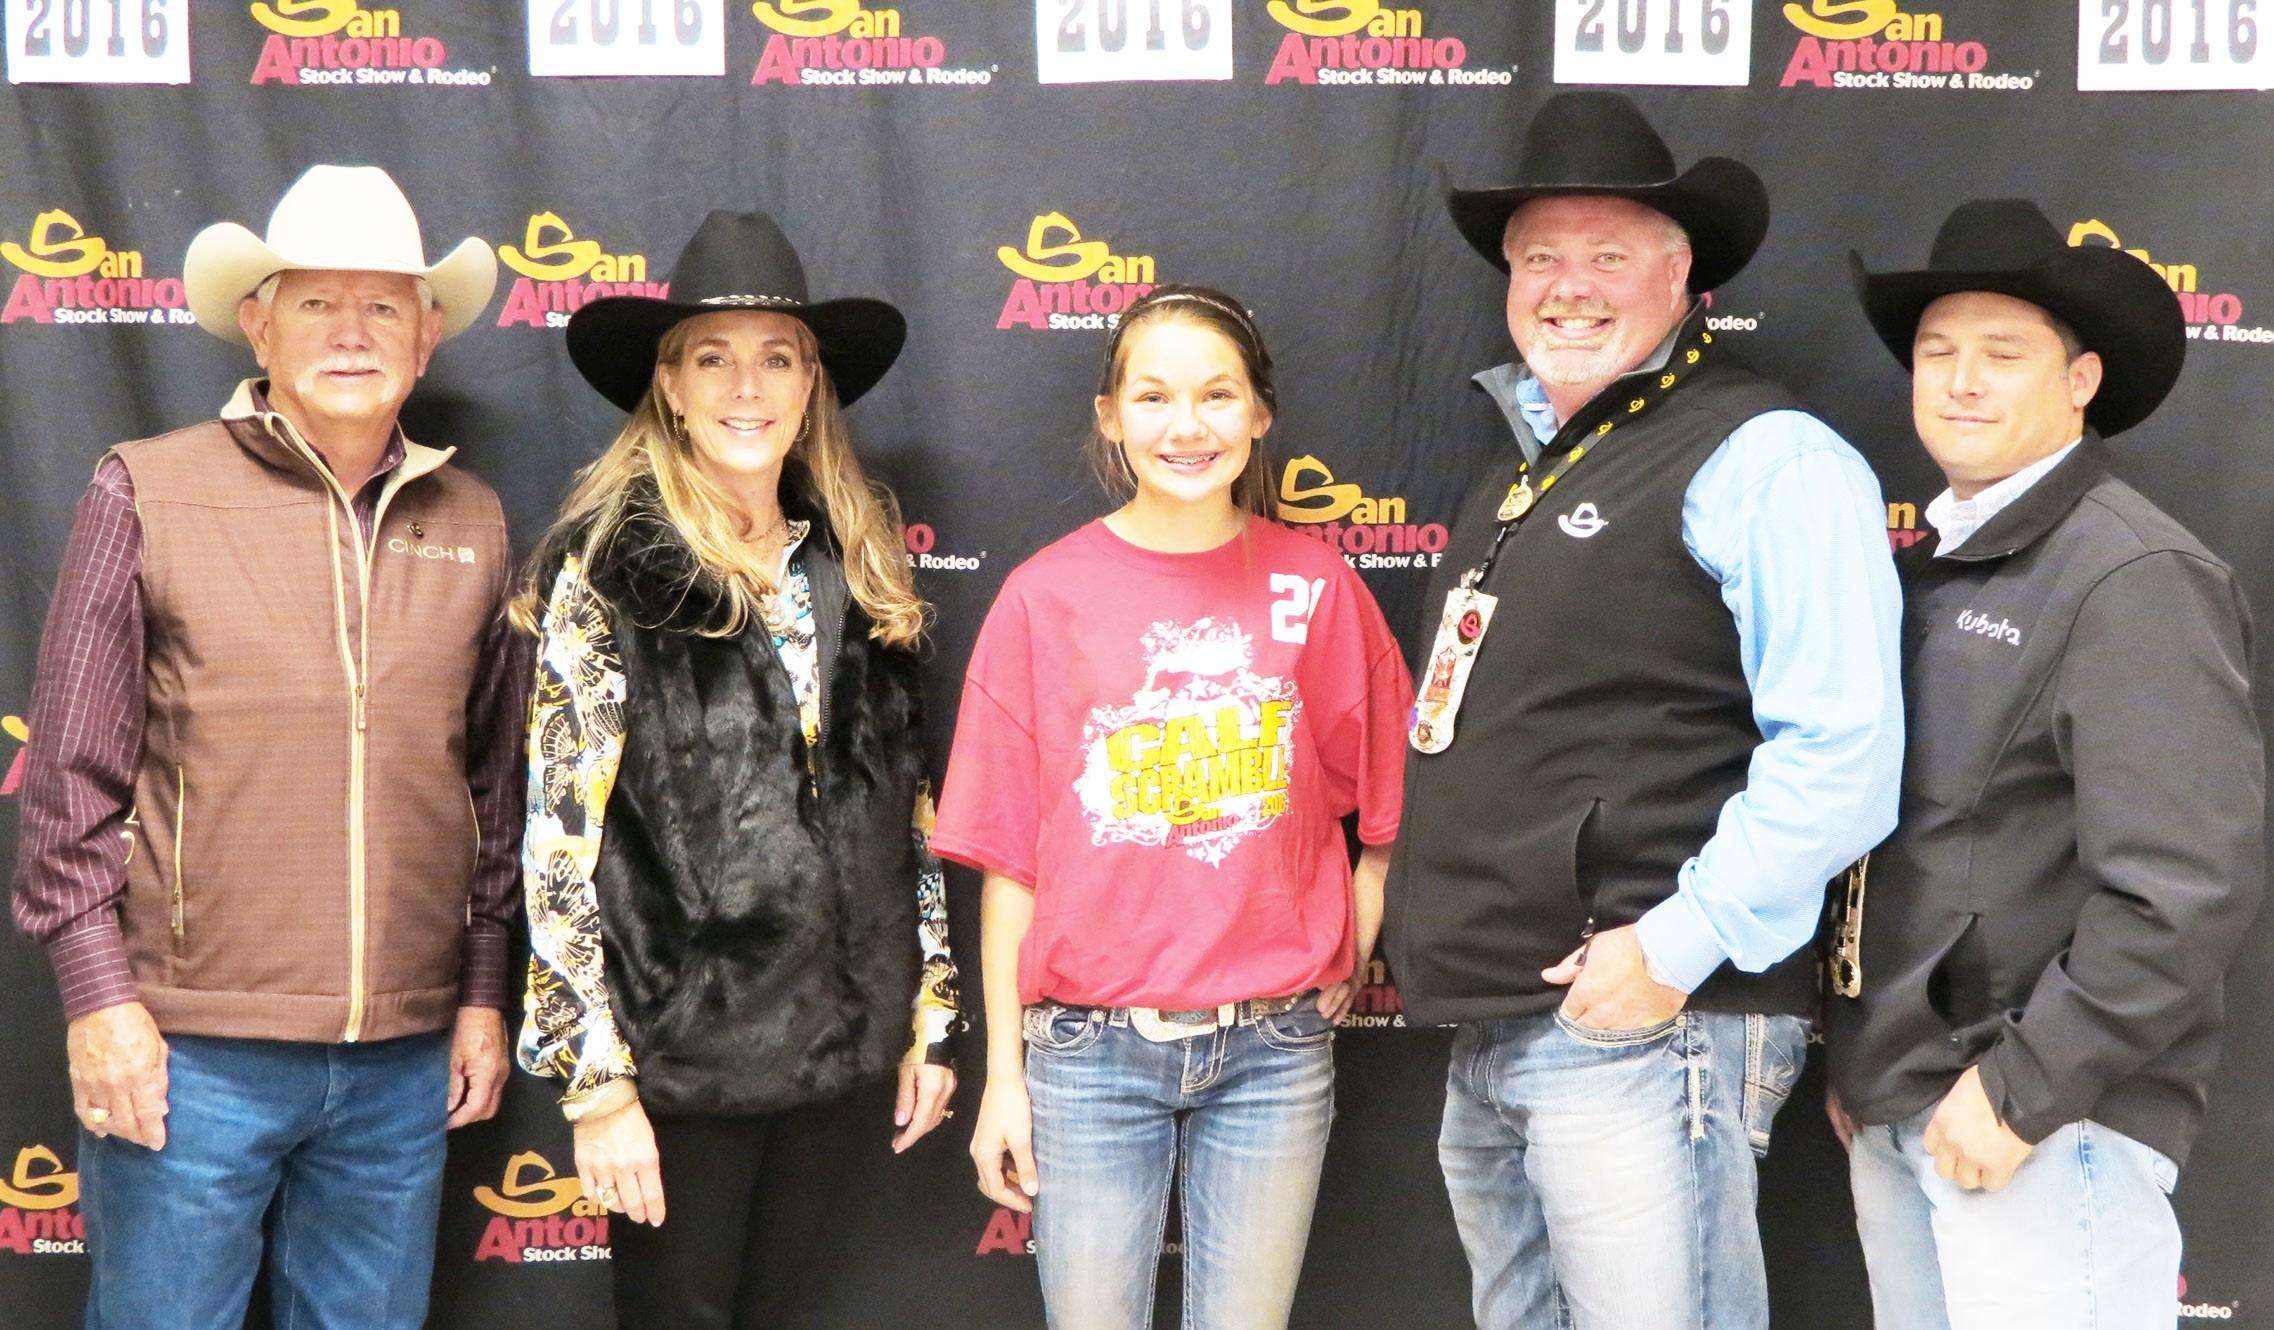 Poteet 7th grader Brooke Rassmussen won in the Calf Scramble at the San Antonio Stock show last month.